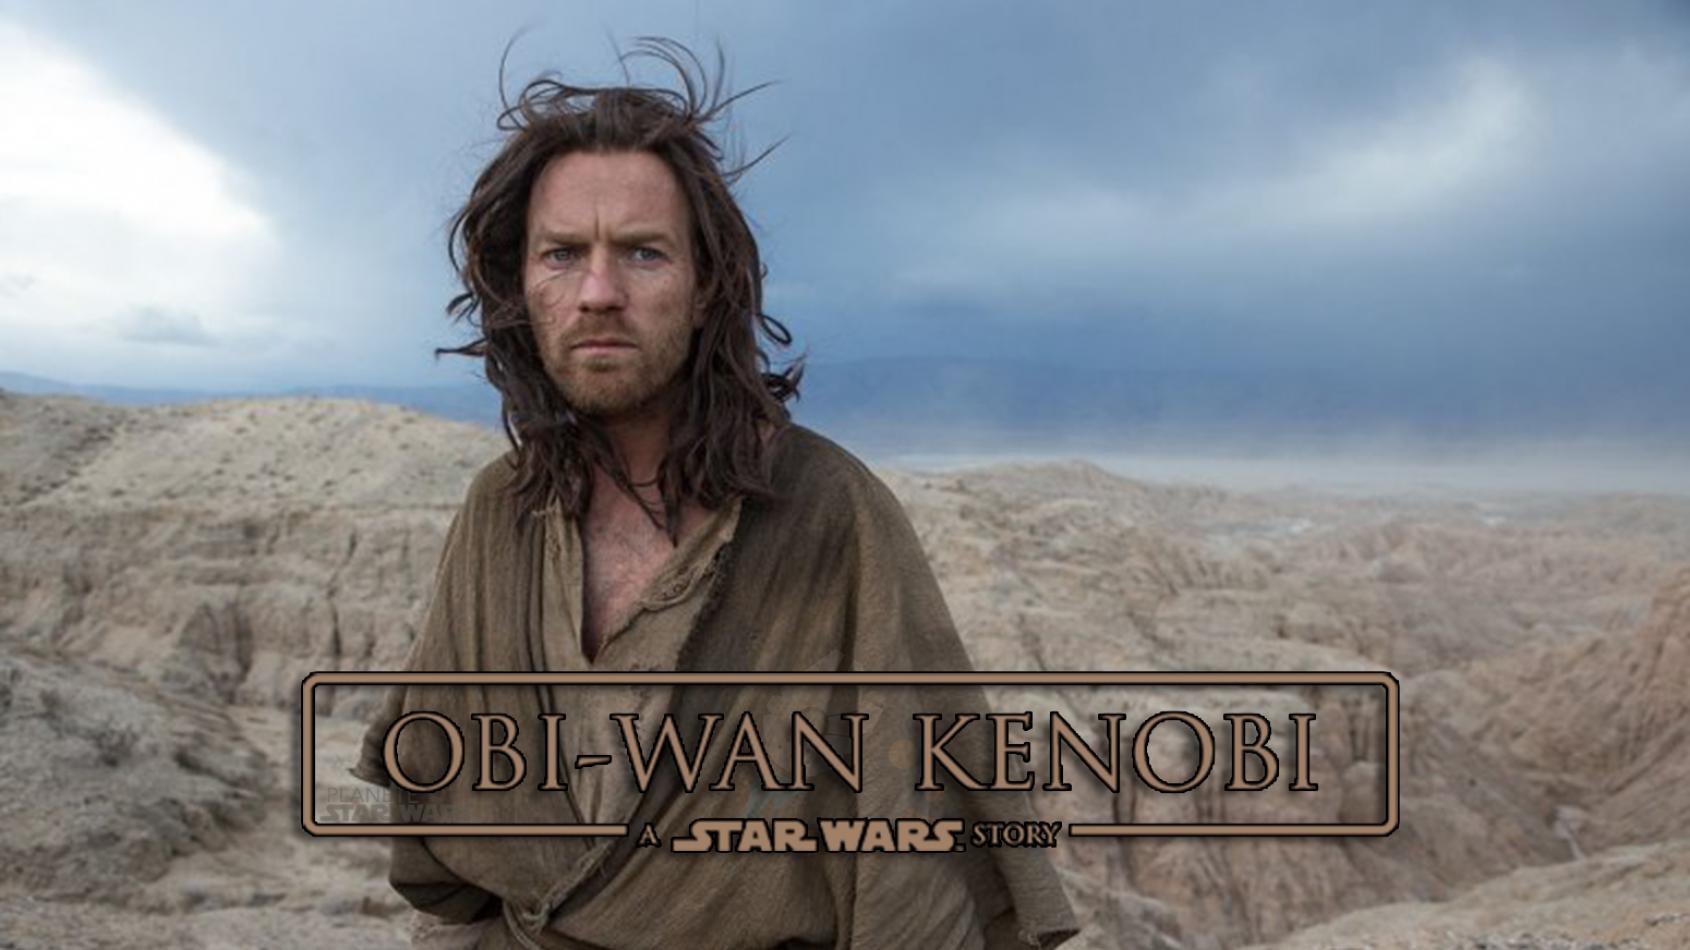 Gareth Edwards & Obi-Wan Kenobi: A Star Wars Story?